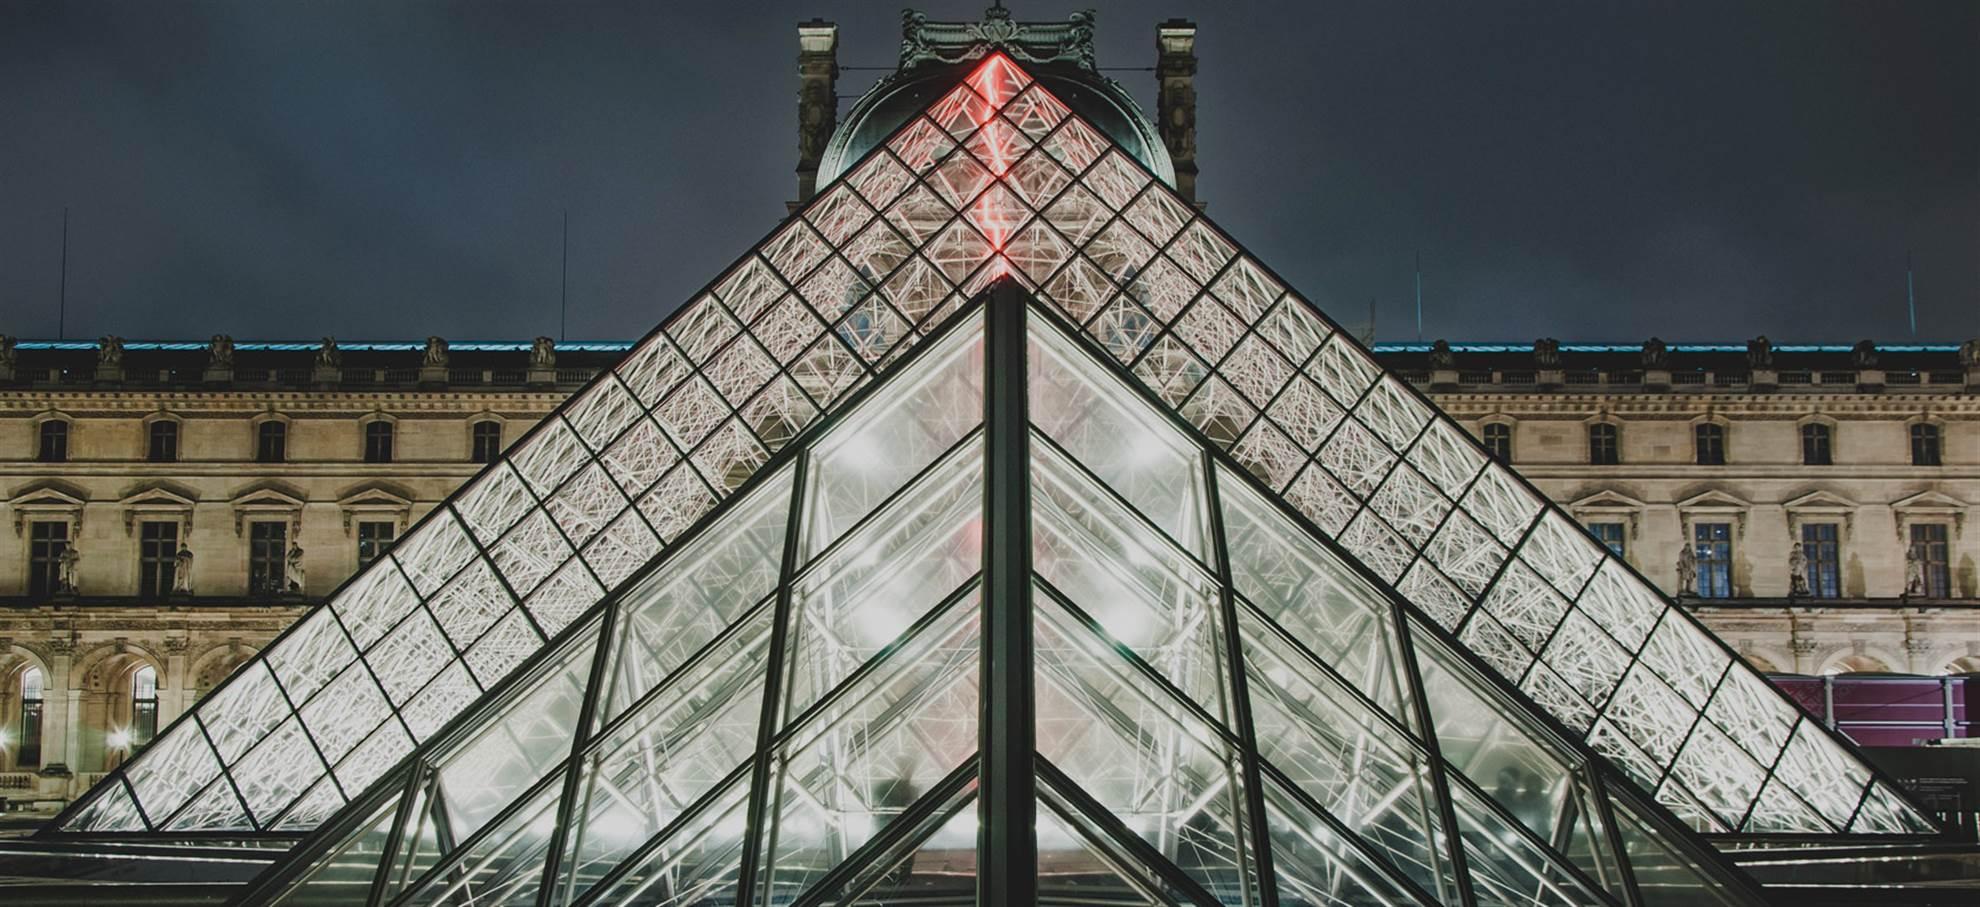 Museo Louvre 'Salta la lunga coda'